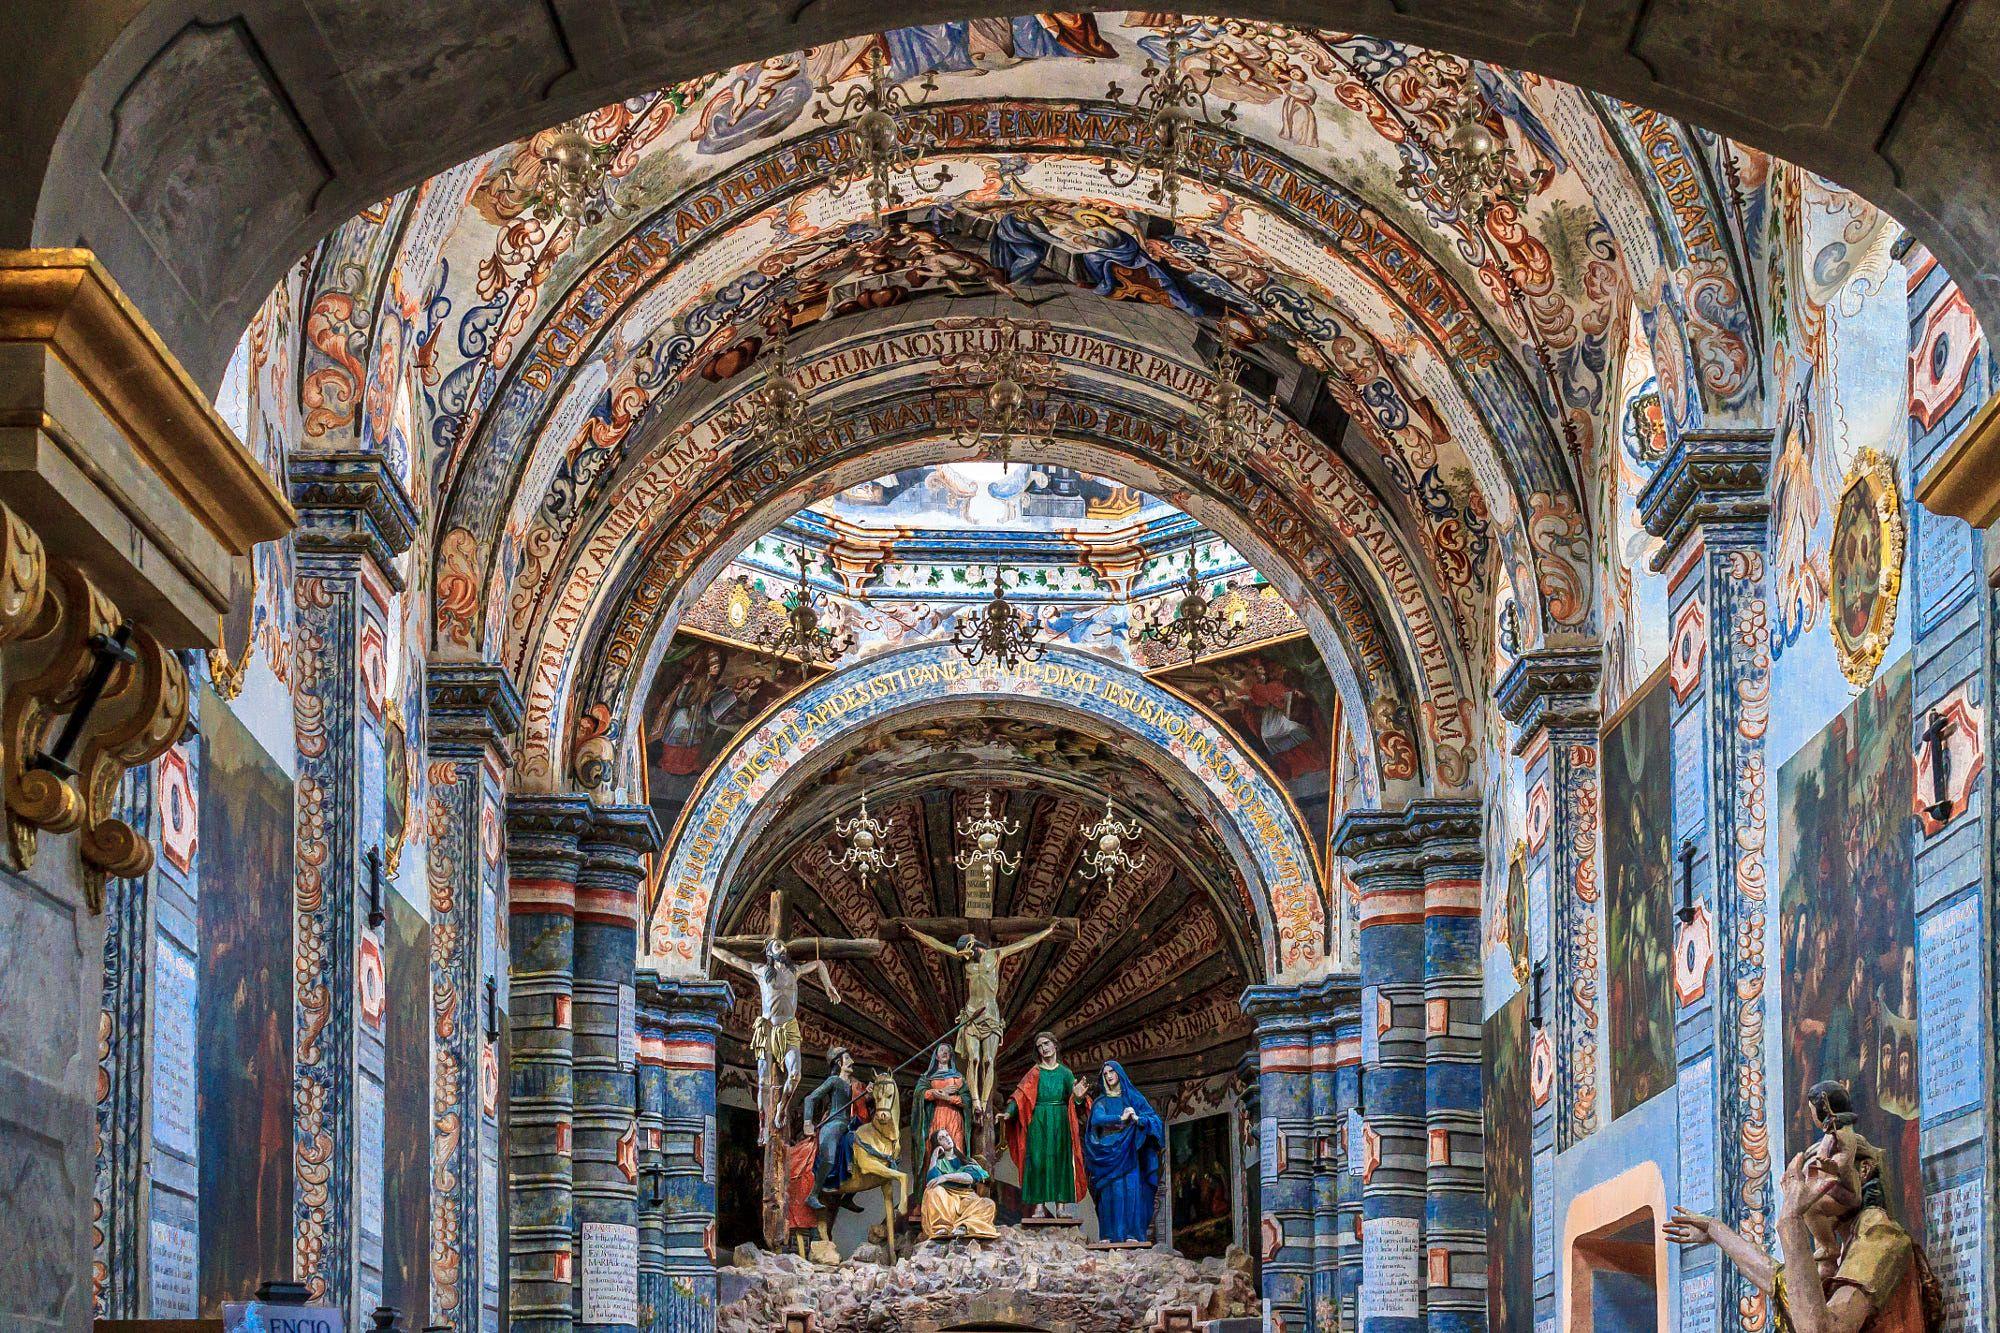 Santuario Atotonilco - Interior